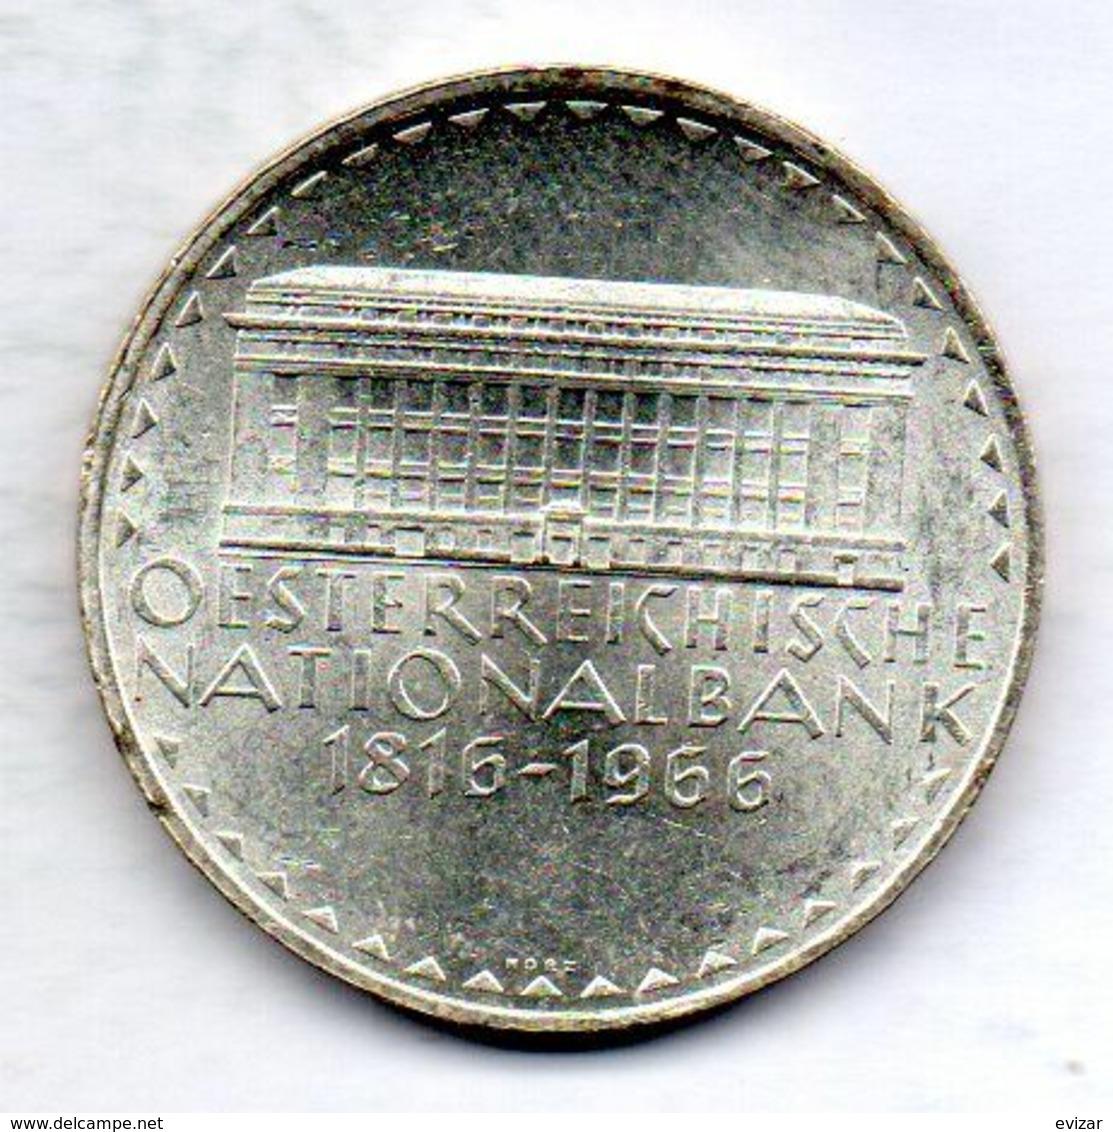 AUSTRIA, 50 Schilling, Silver, Year 1966, KM #2900 - Austria